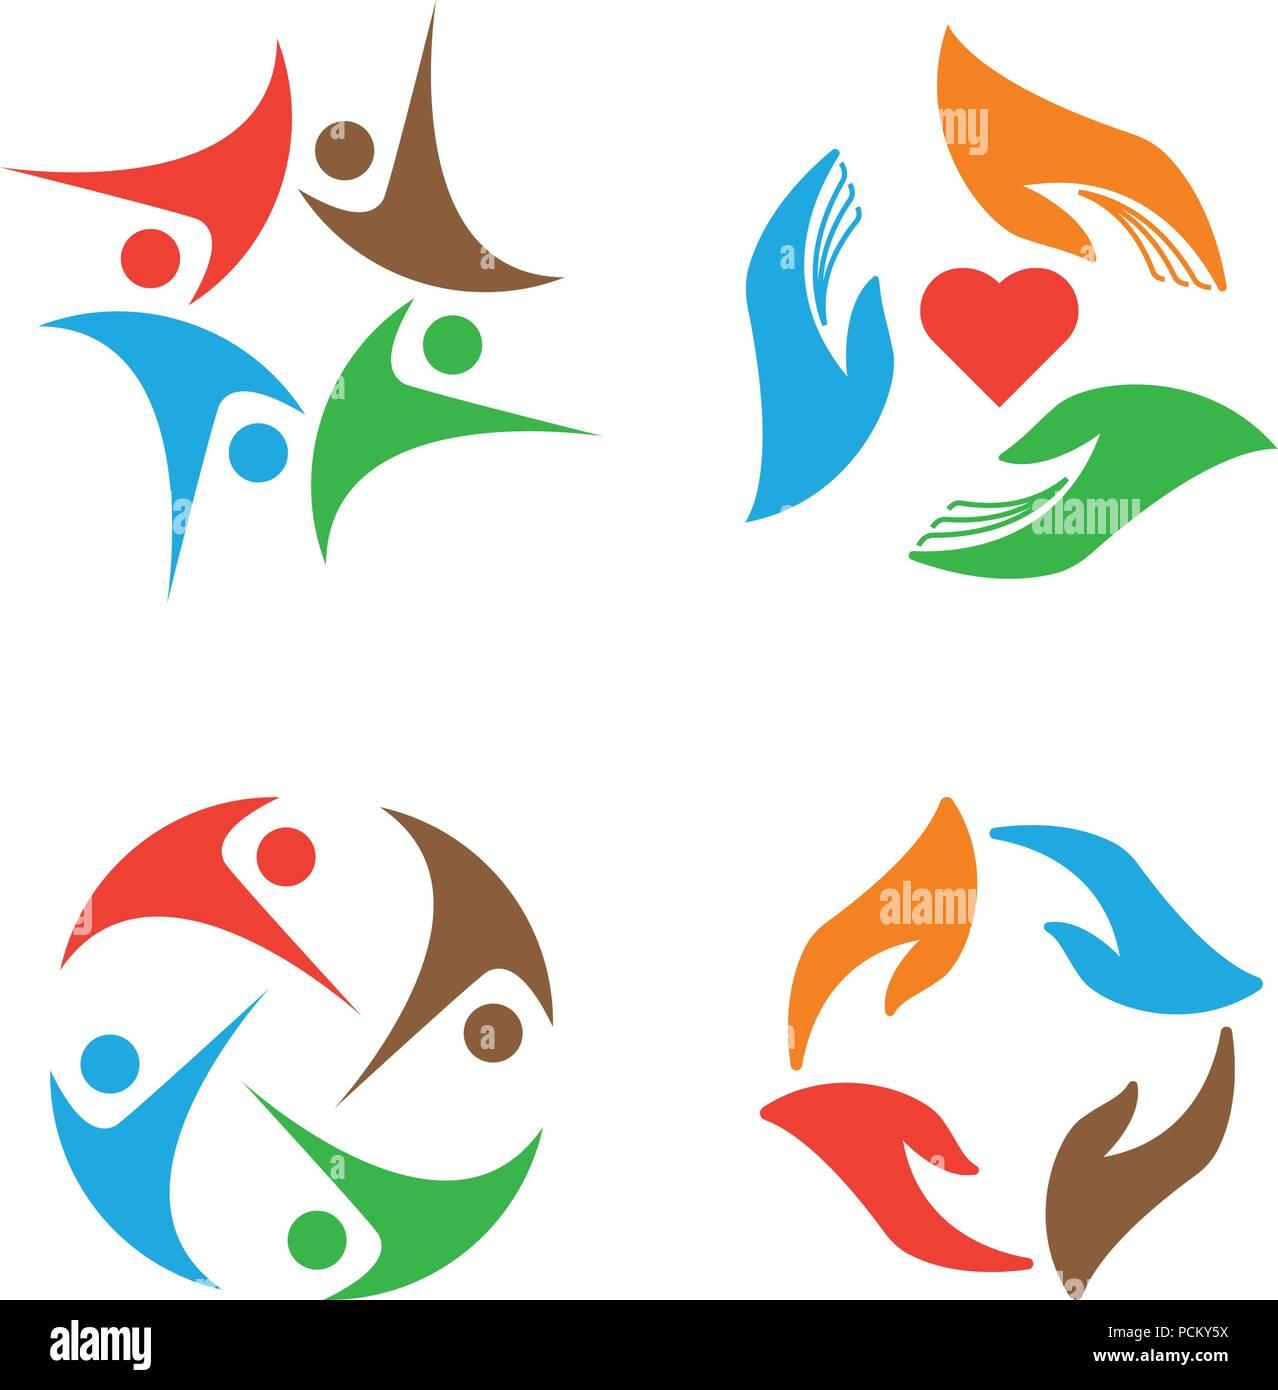 Community organization logo design template Stock Vector Art